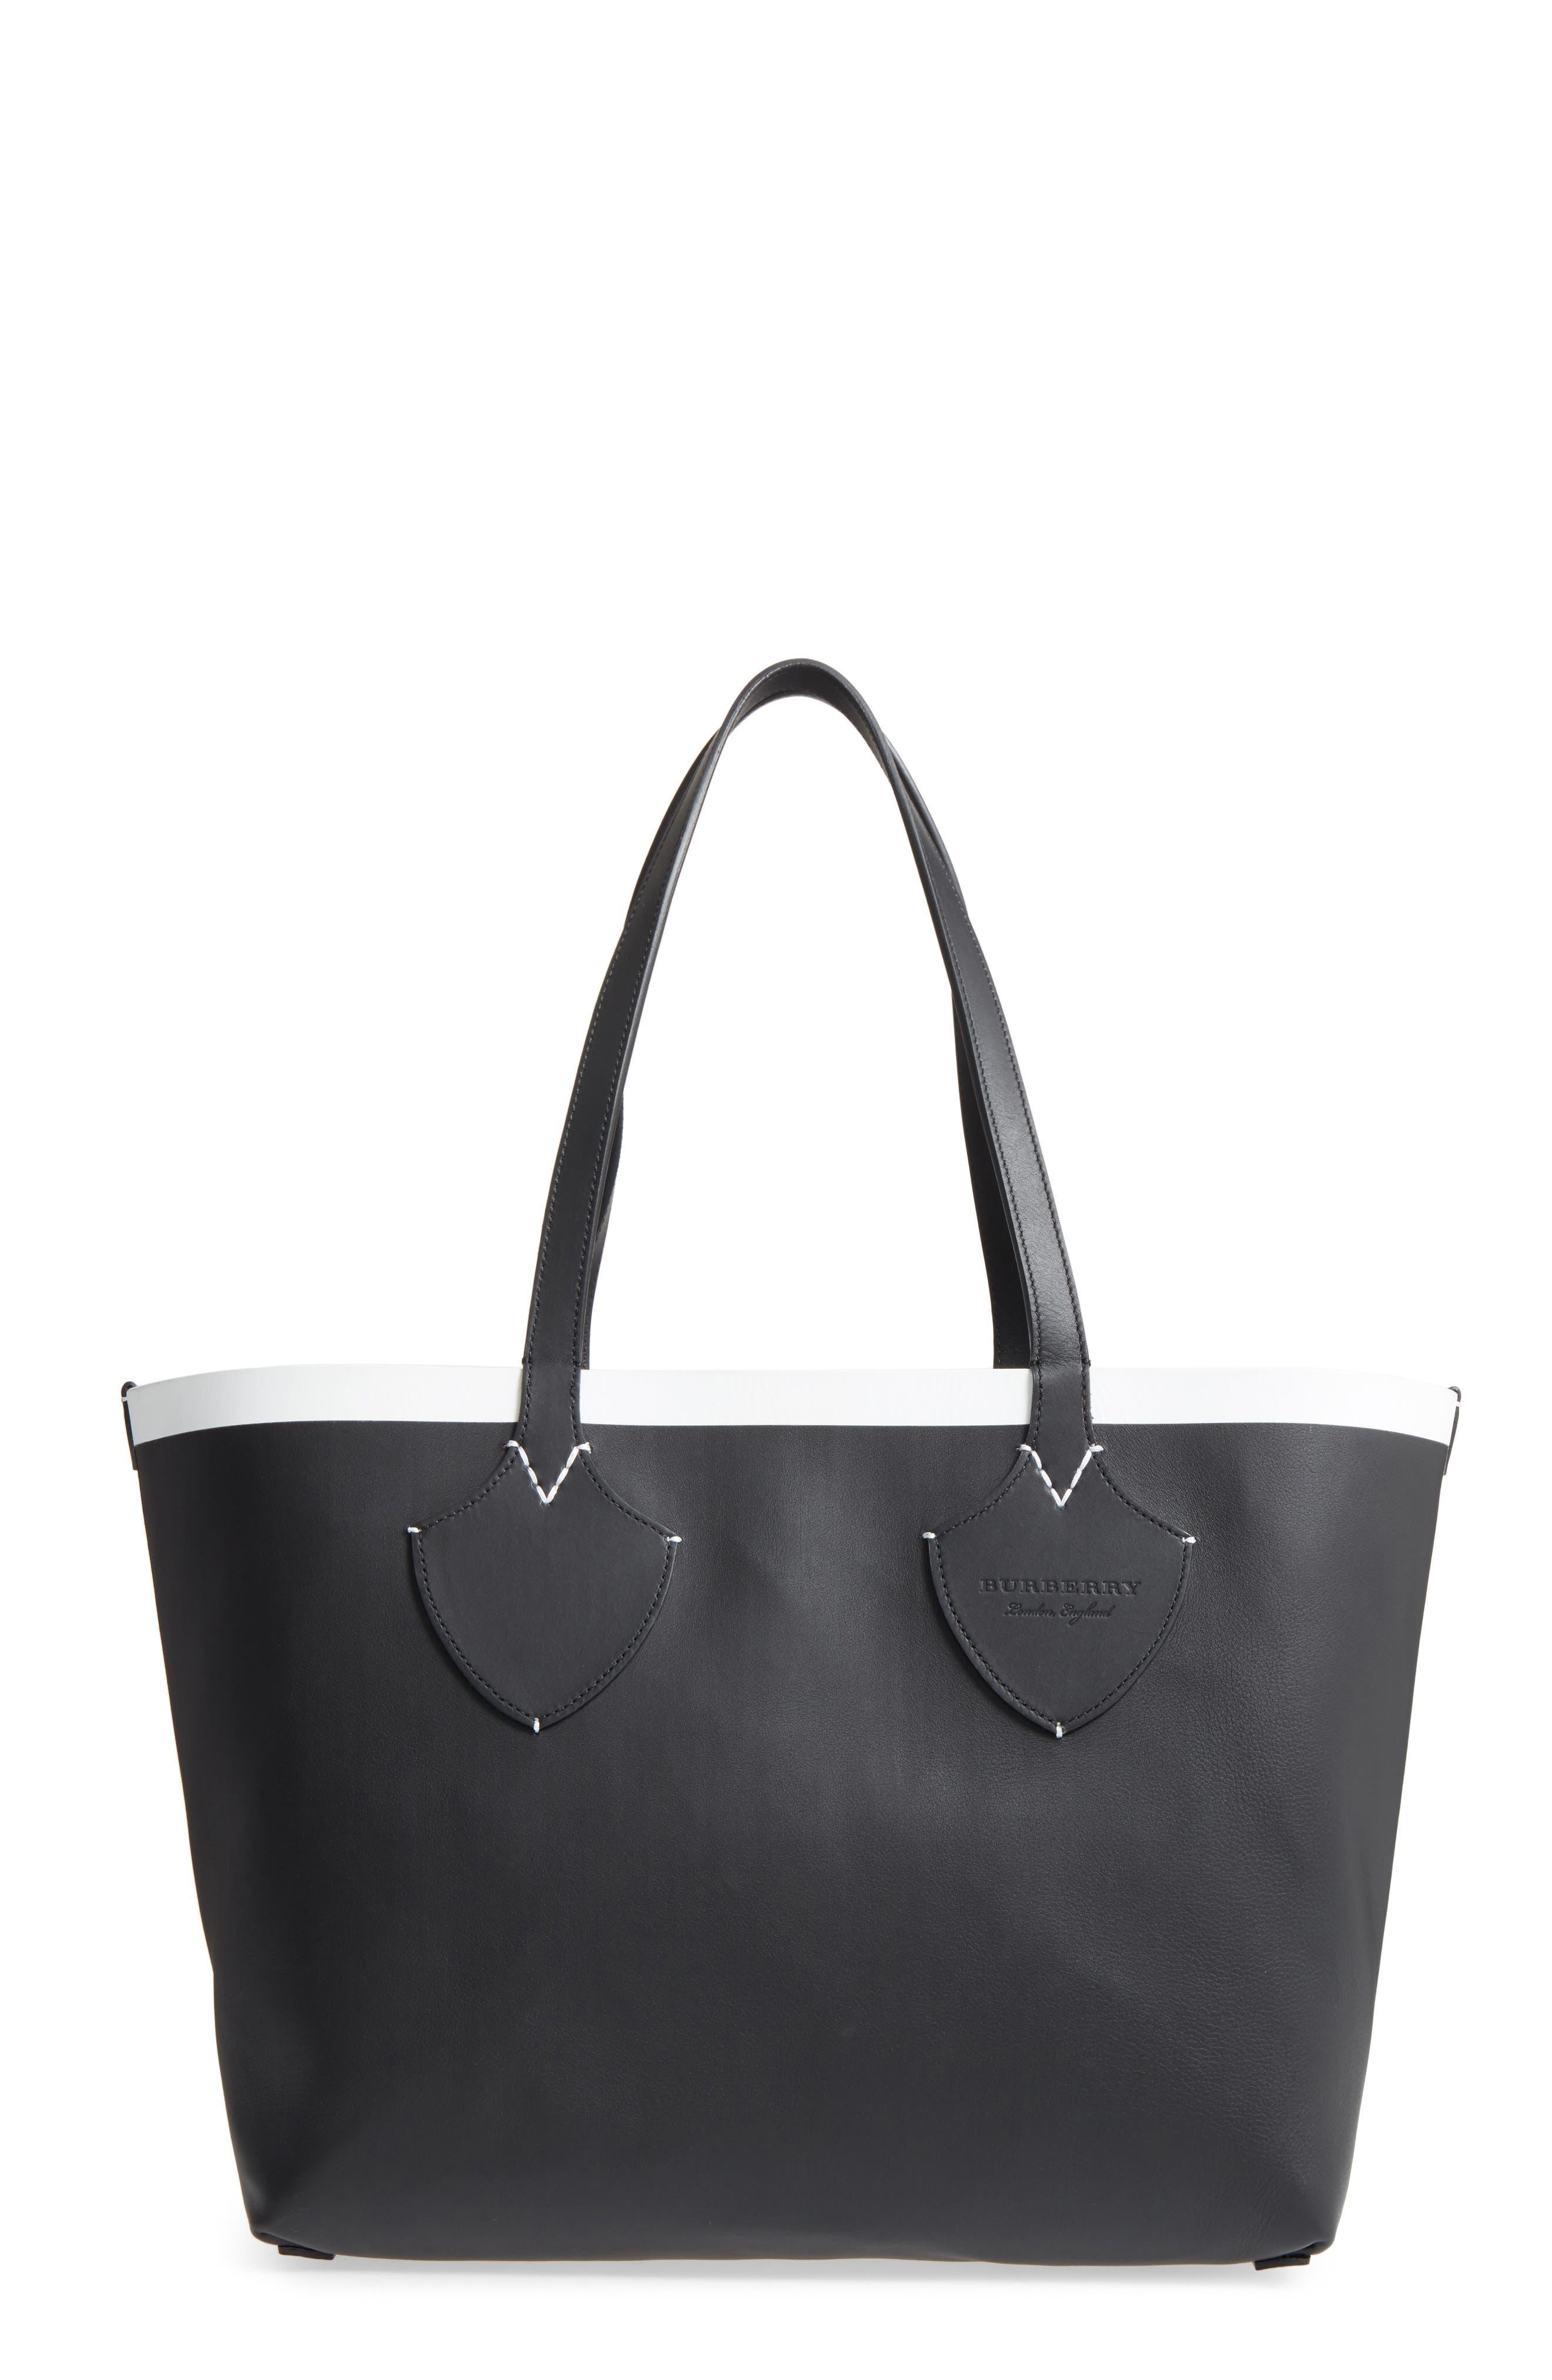 Medium Reversible Leather & Check Canvas Tote,                             Main thumbnail 1, color,                             BLACK/ WHITE